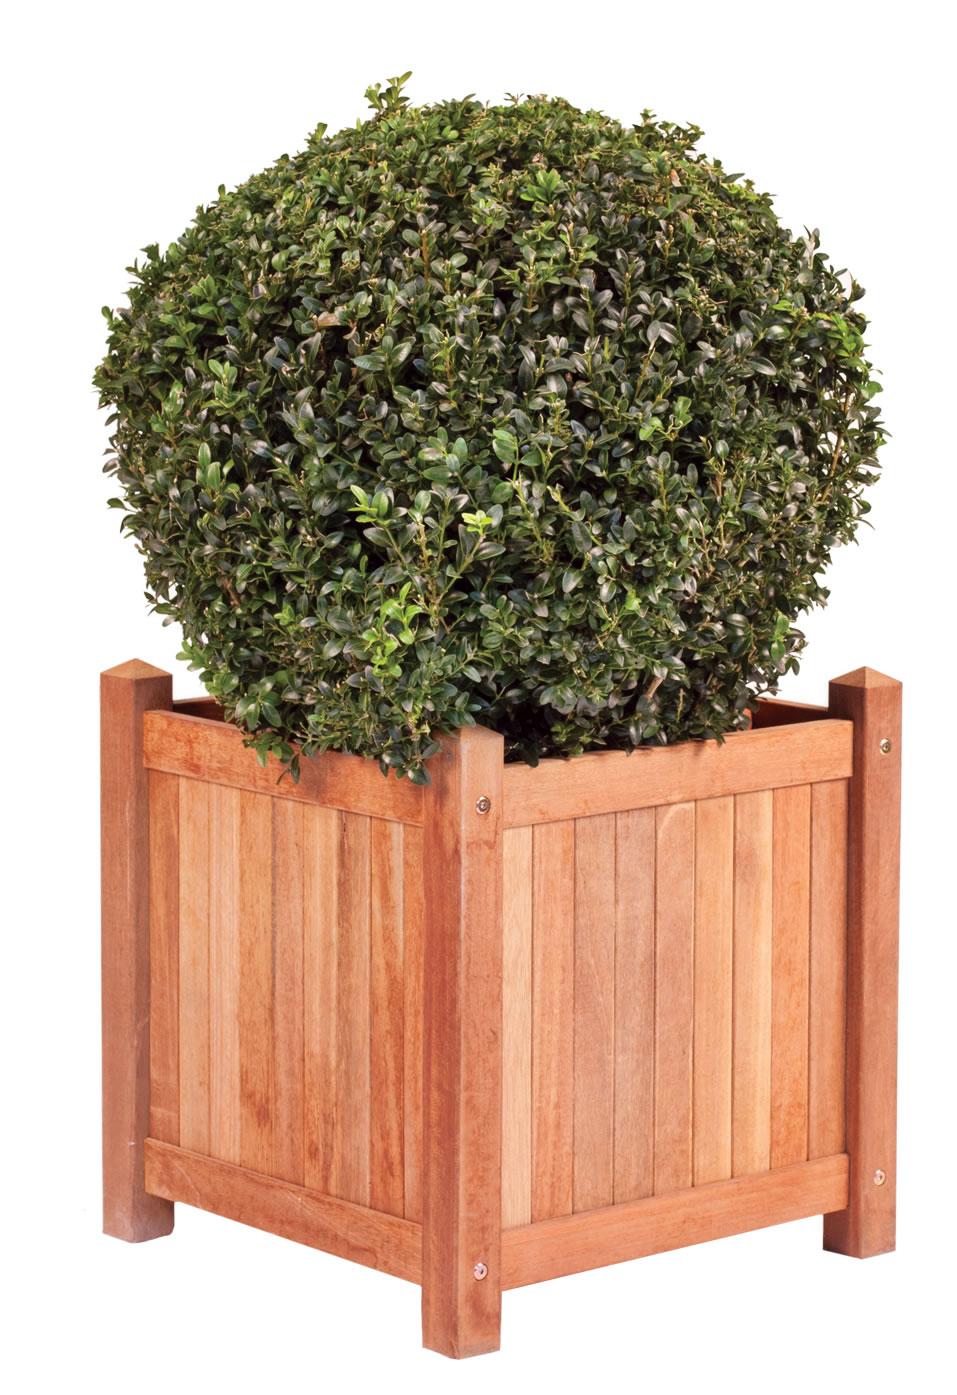 Hardwood teak planter